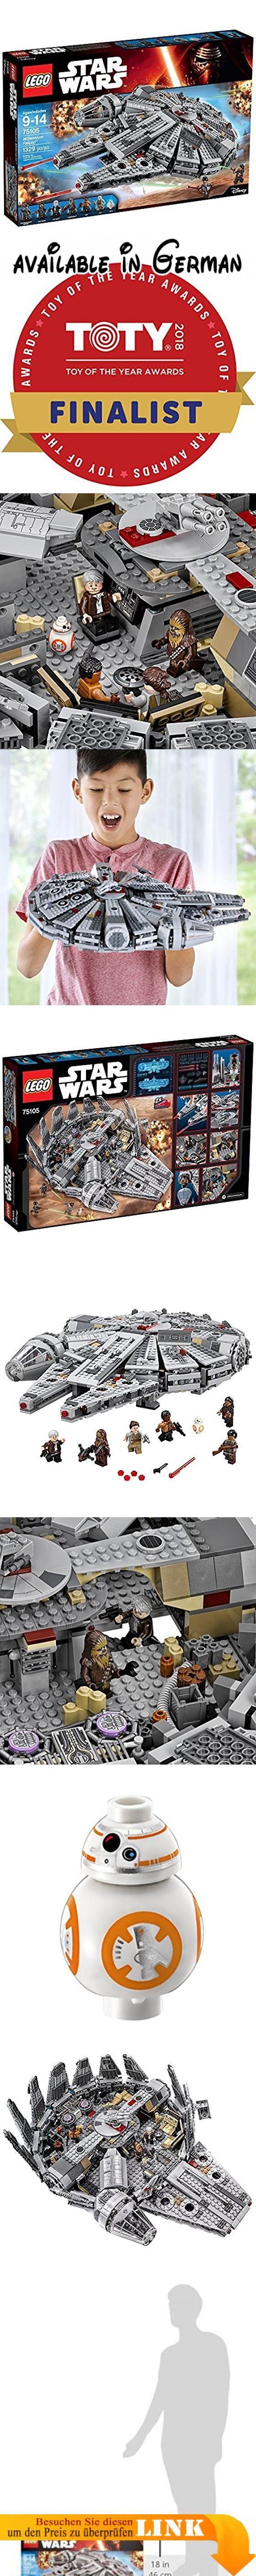 LEGO Star Wars Millennium Falcon 75105 Building Kit by LEGO. LEGO Star Wars Millennium Falcon 75105Building Kit. Medium #Toy #TOYS_AND_GAMES